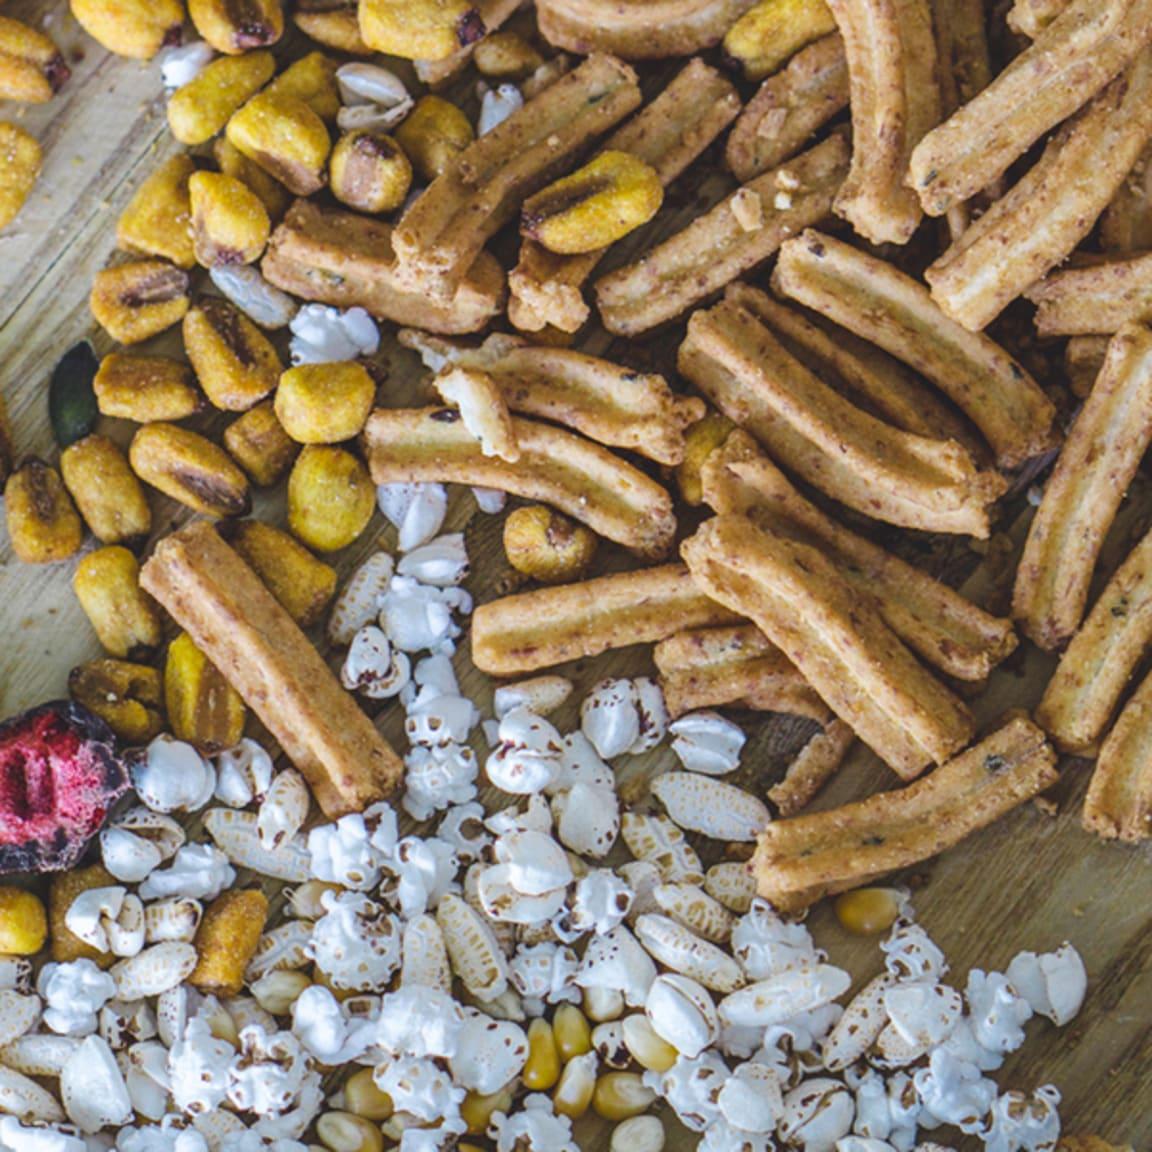 Naked Foods: Grab & go